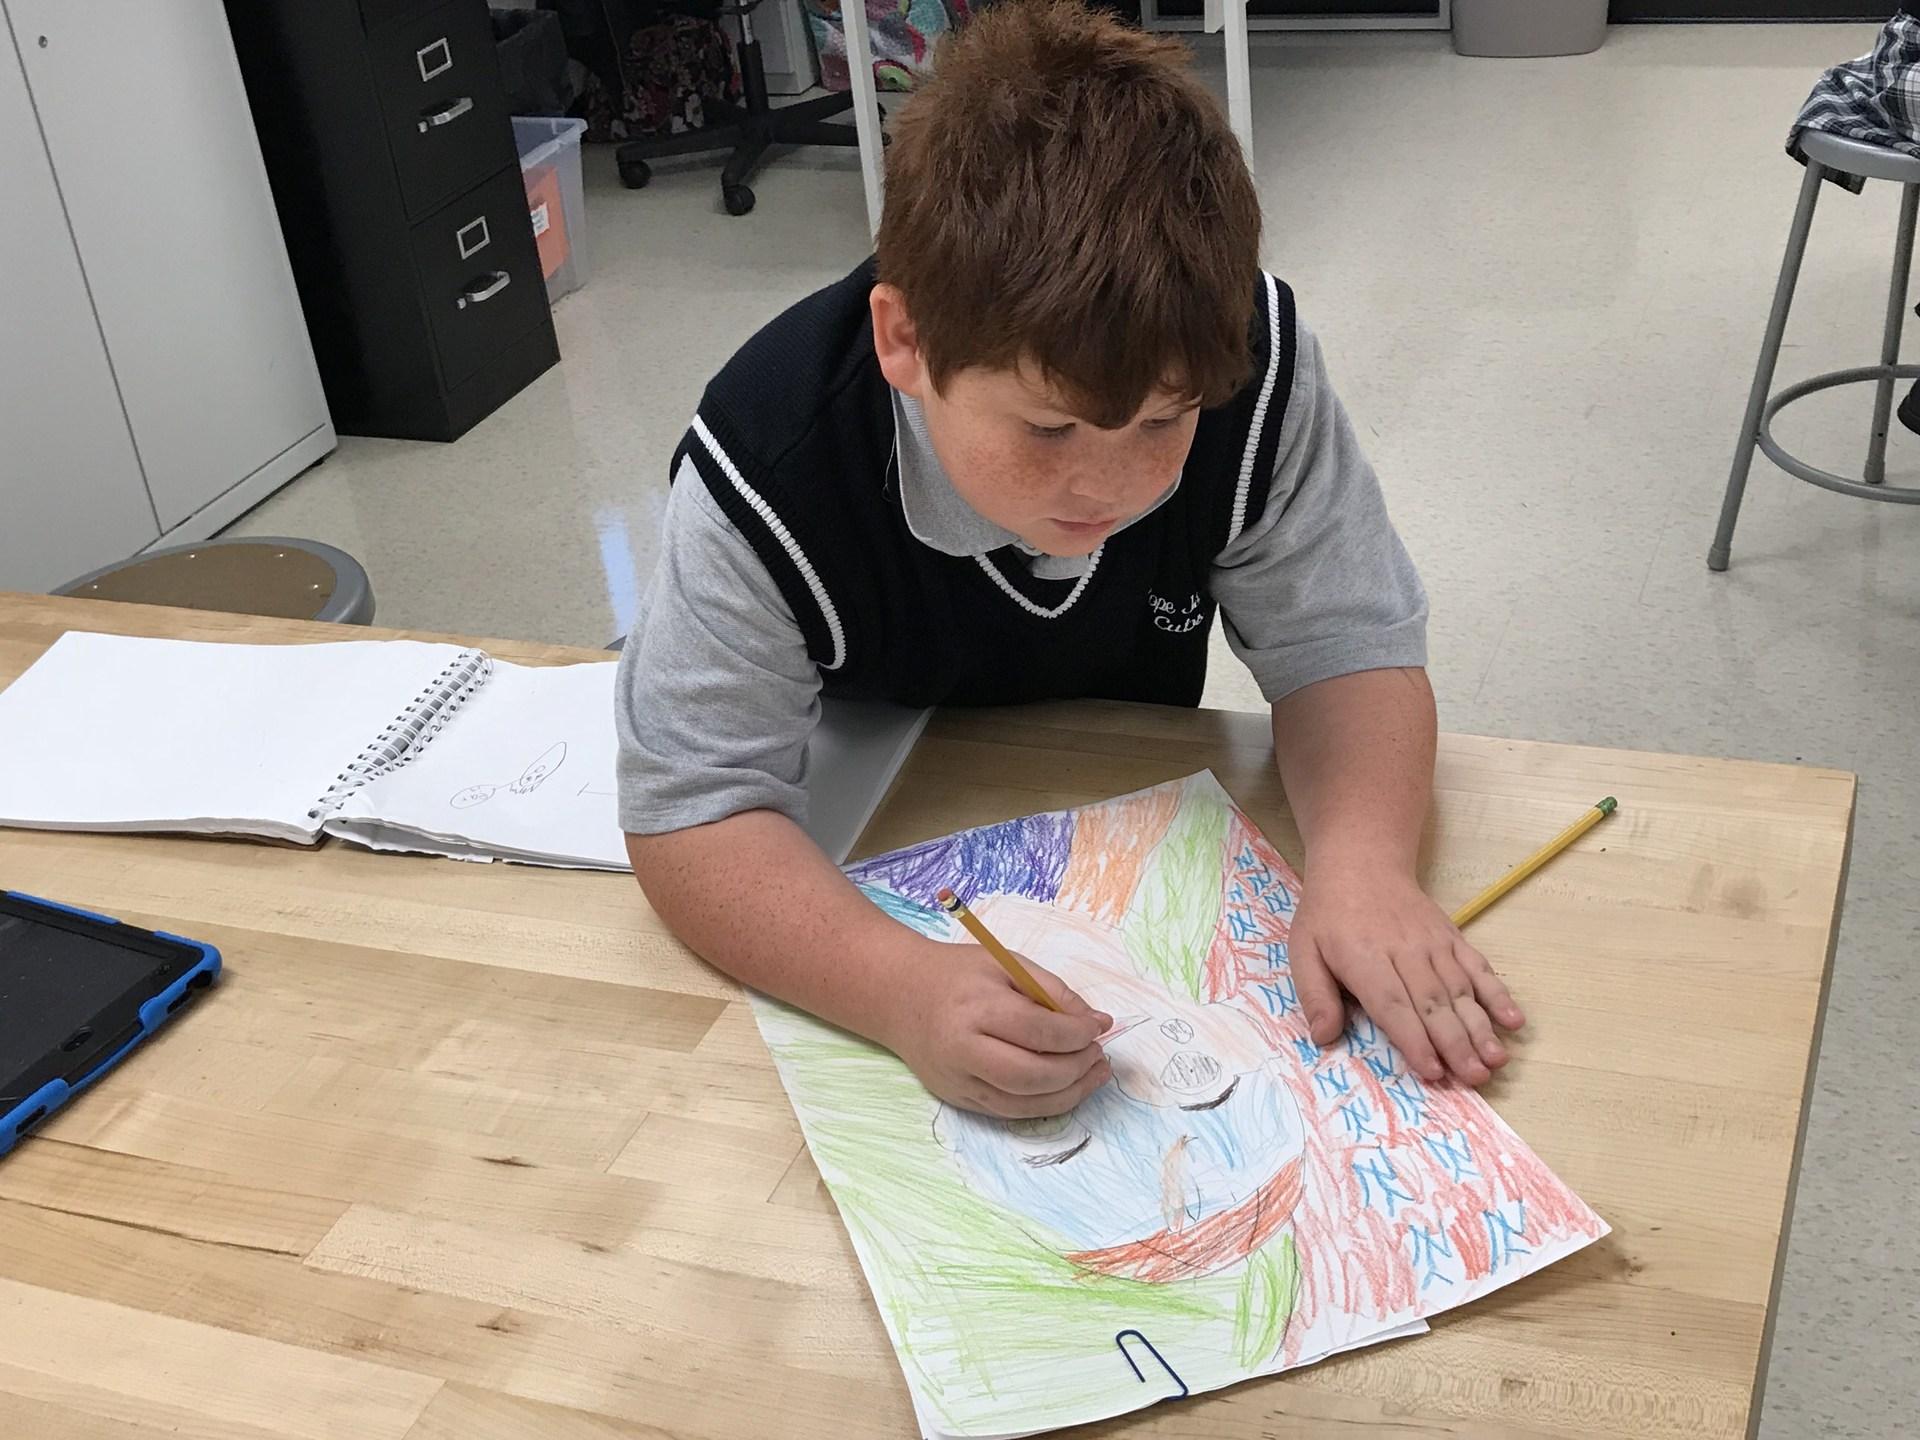 Boy beginning drawing